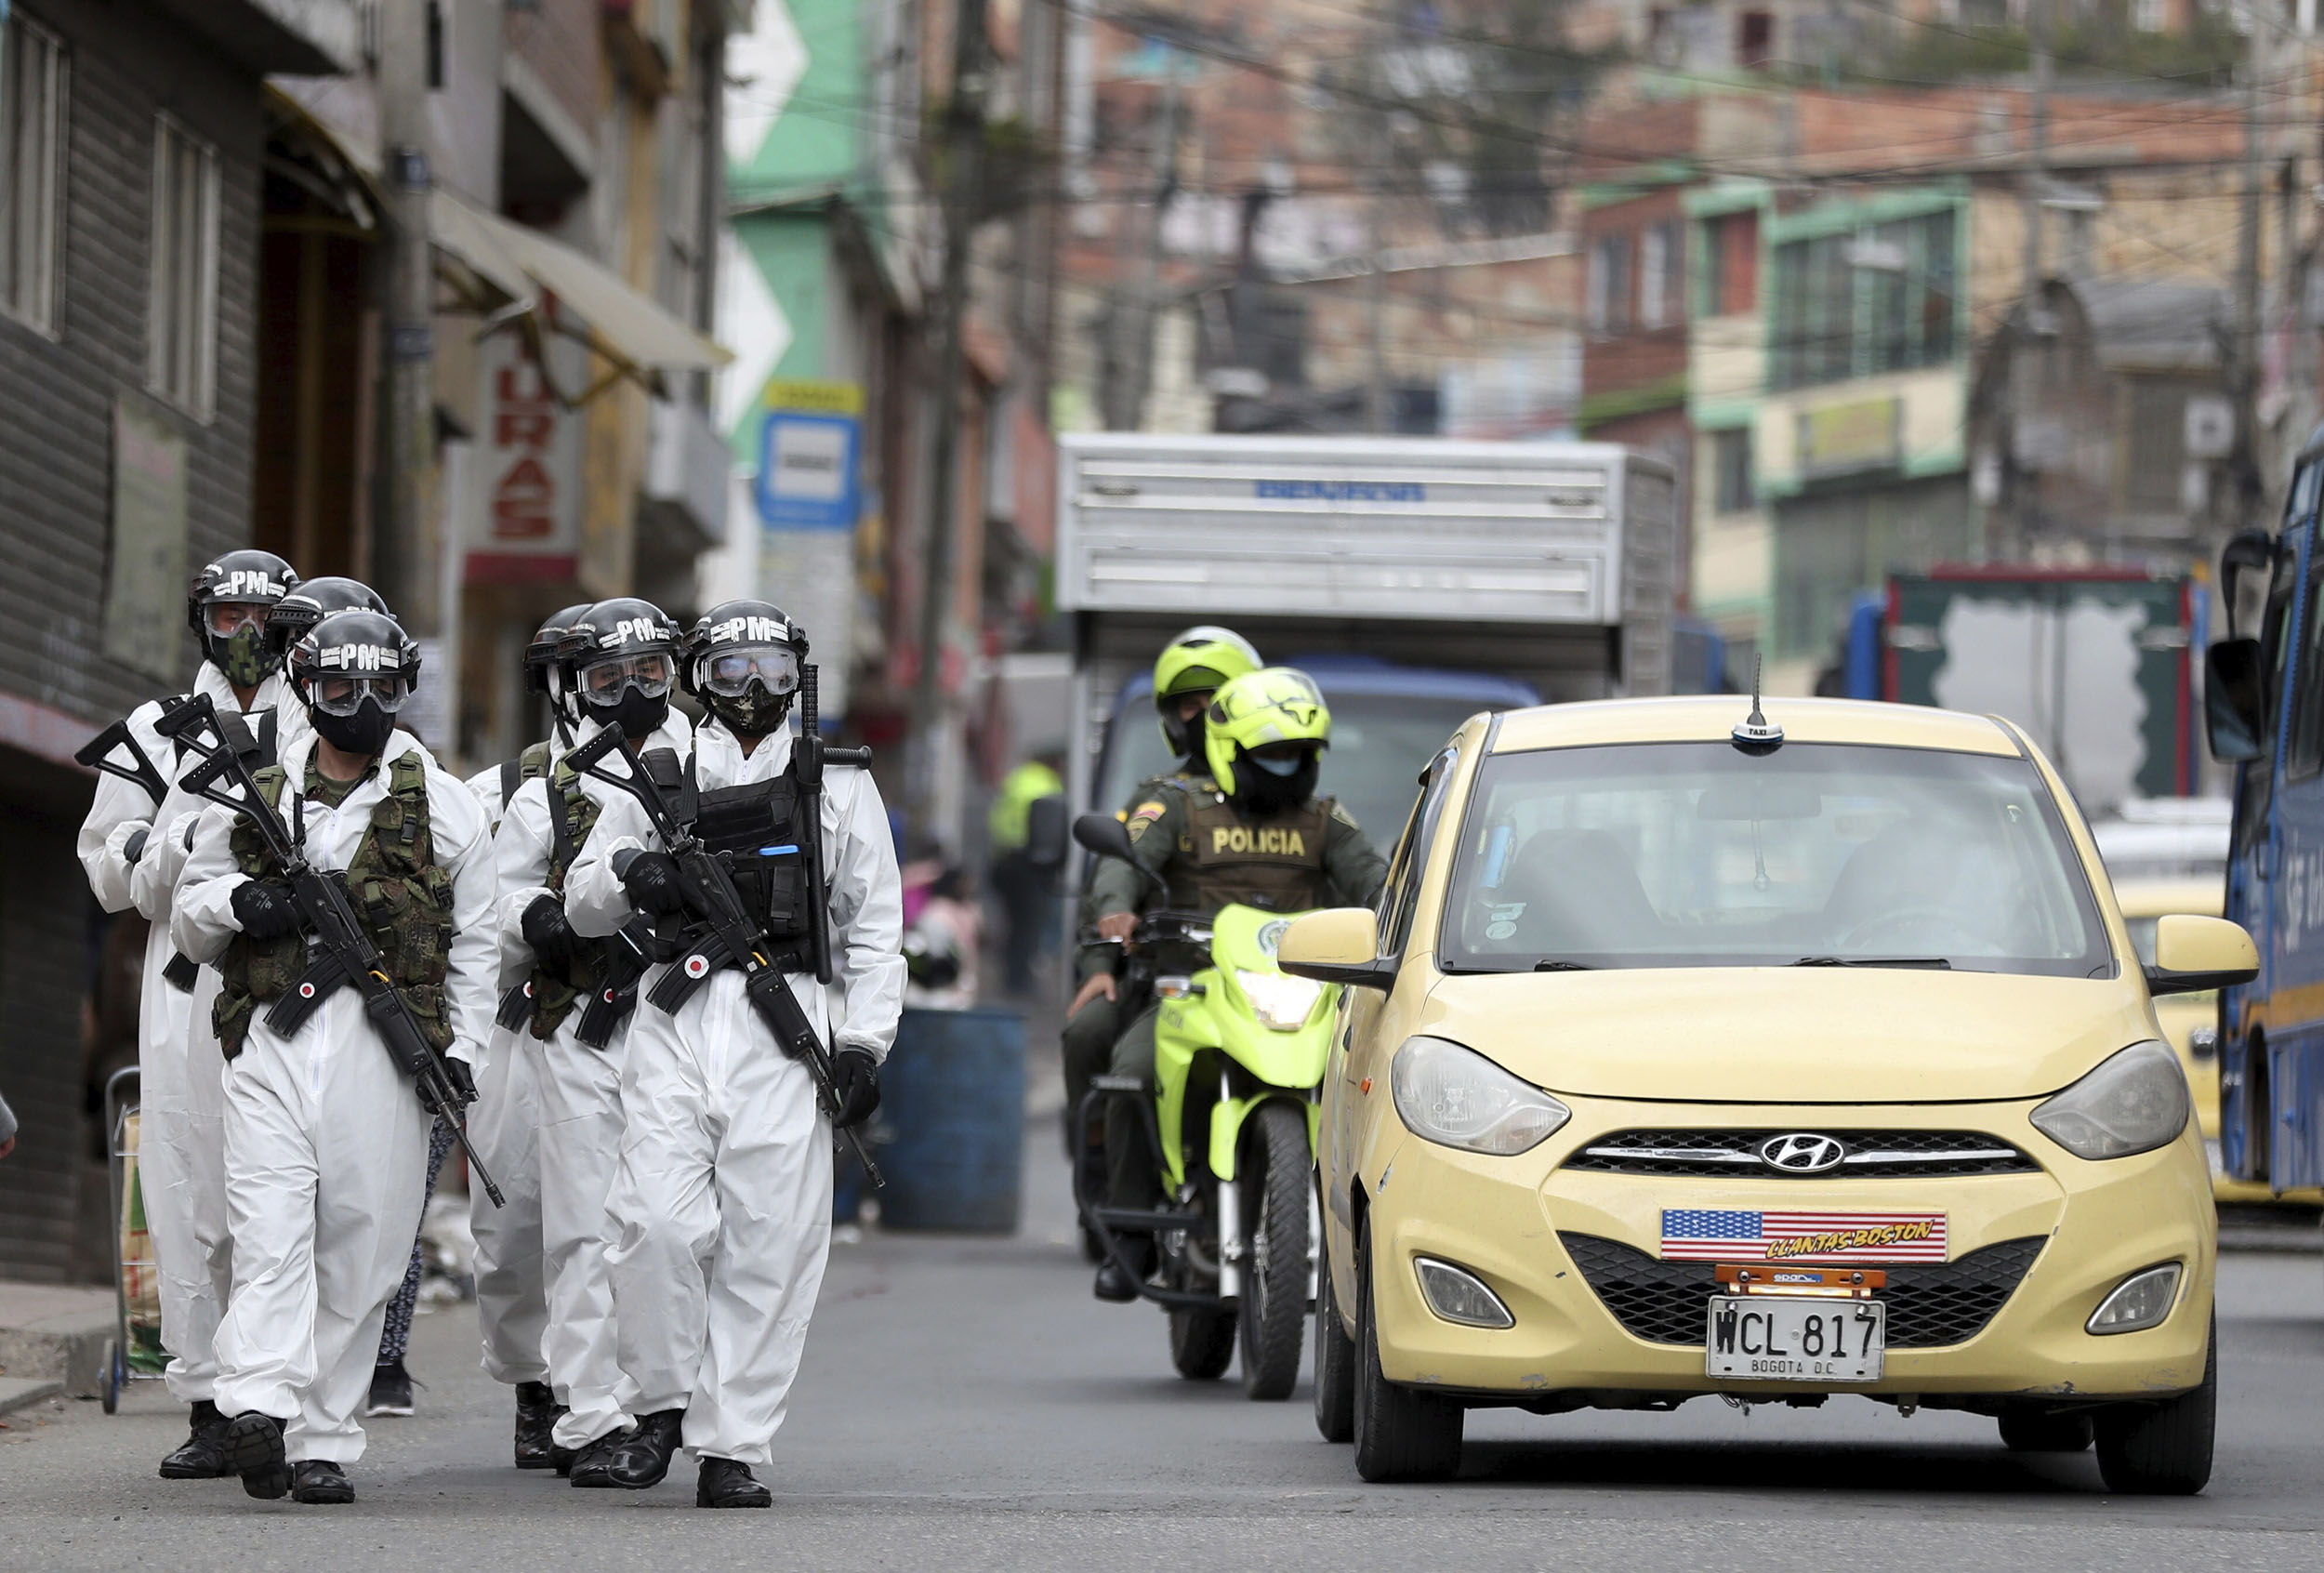 Soldiers patrol a neighborhood in Bogota, Colombia, on July 13.